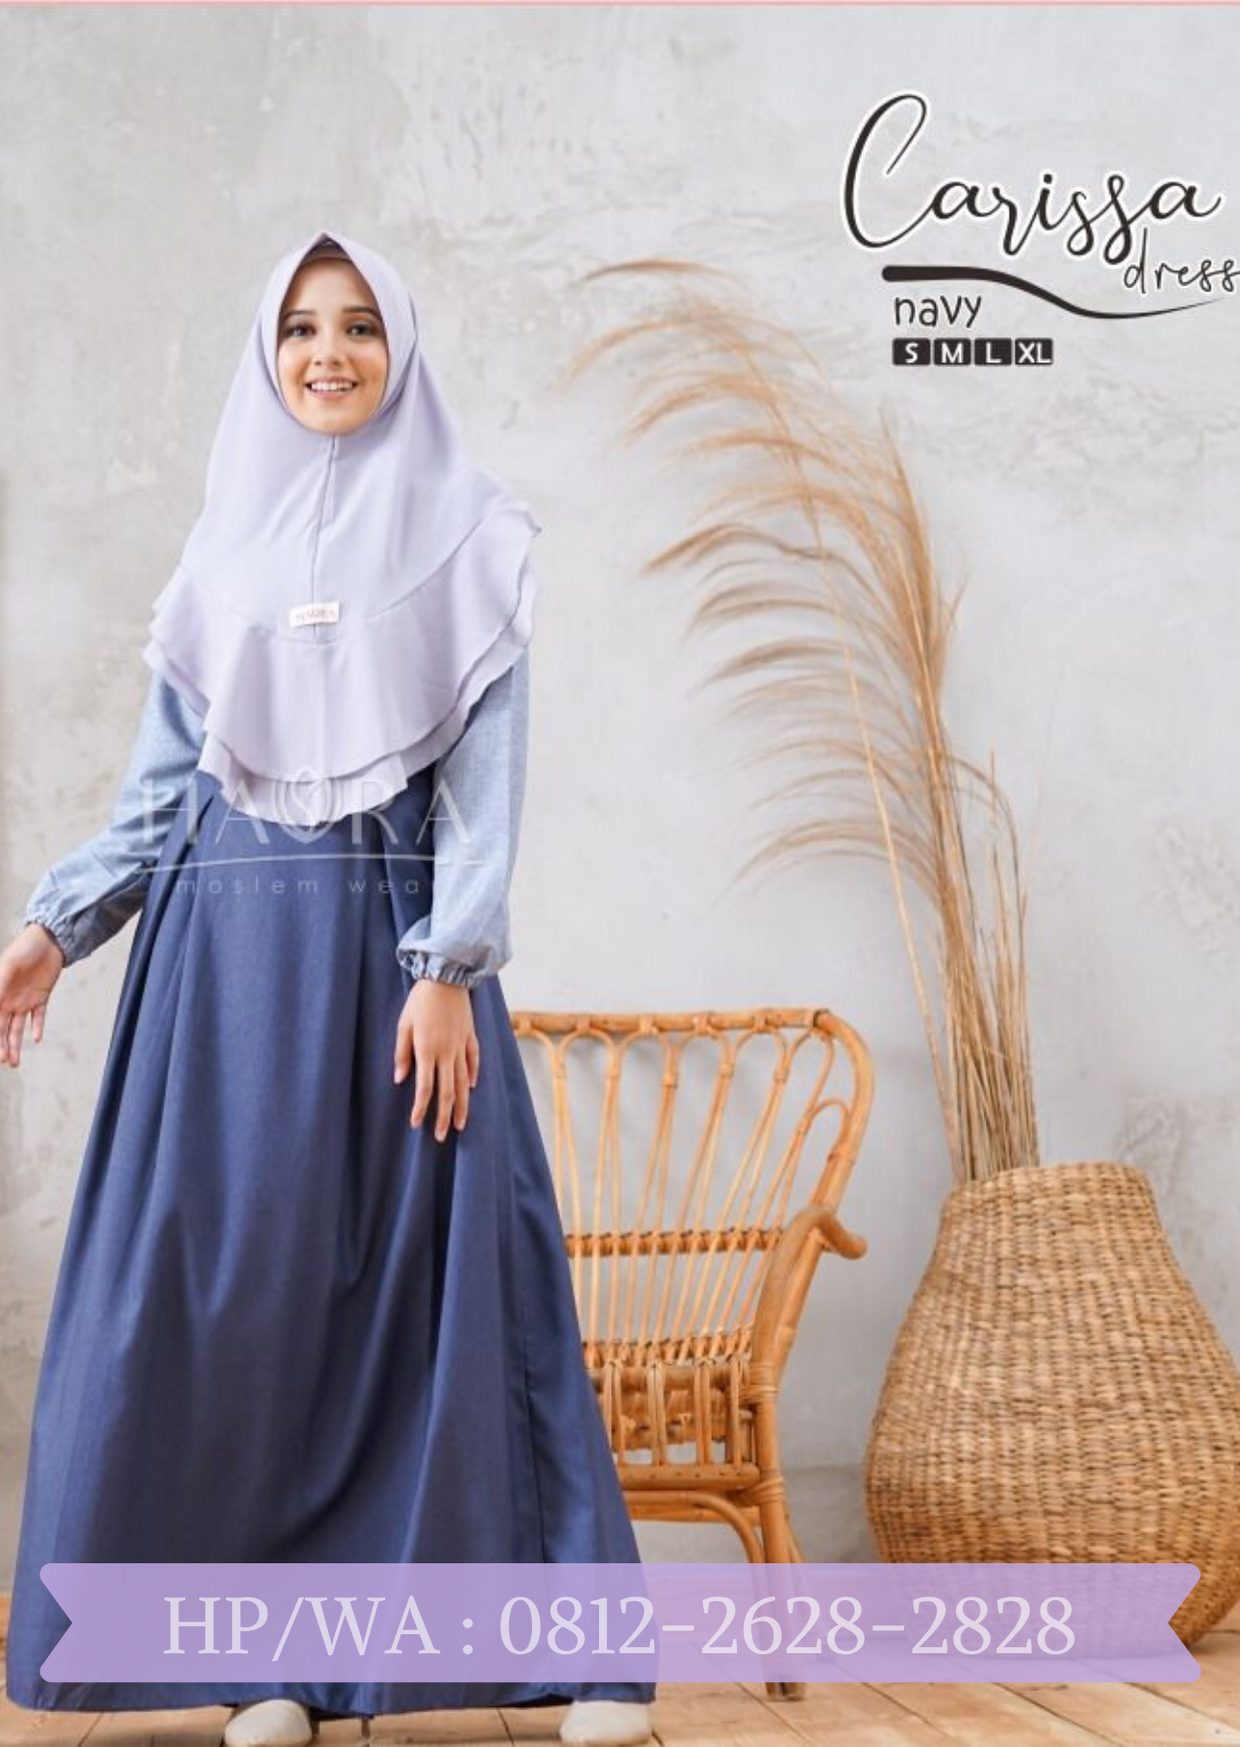 Produsen Gamis Tunik Hijab Cilacap Grosir Kaftan Baju Lebaran Khimar Cilacap Tunik Hijab Wanita